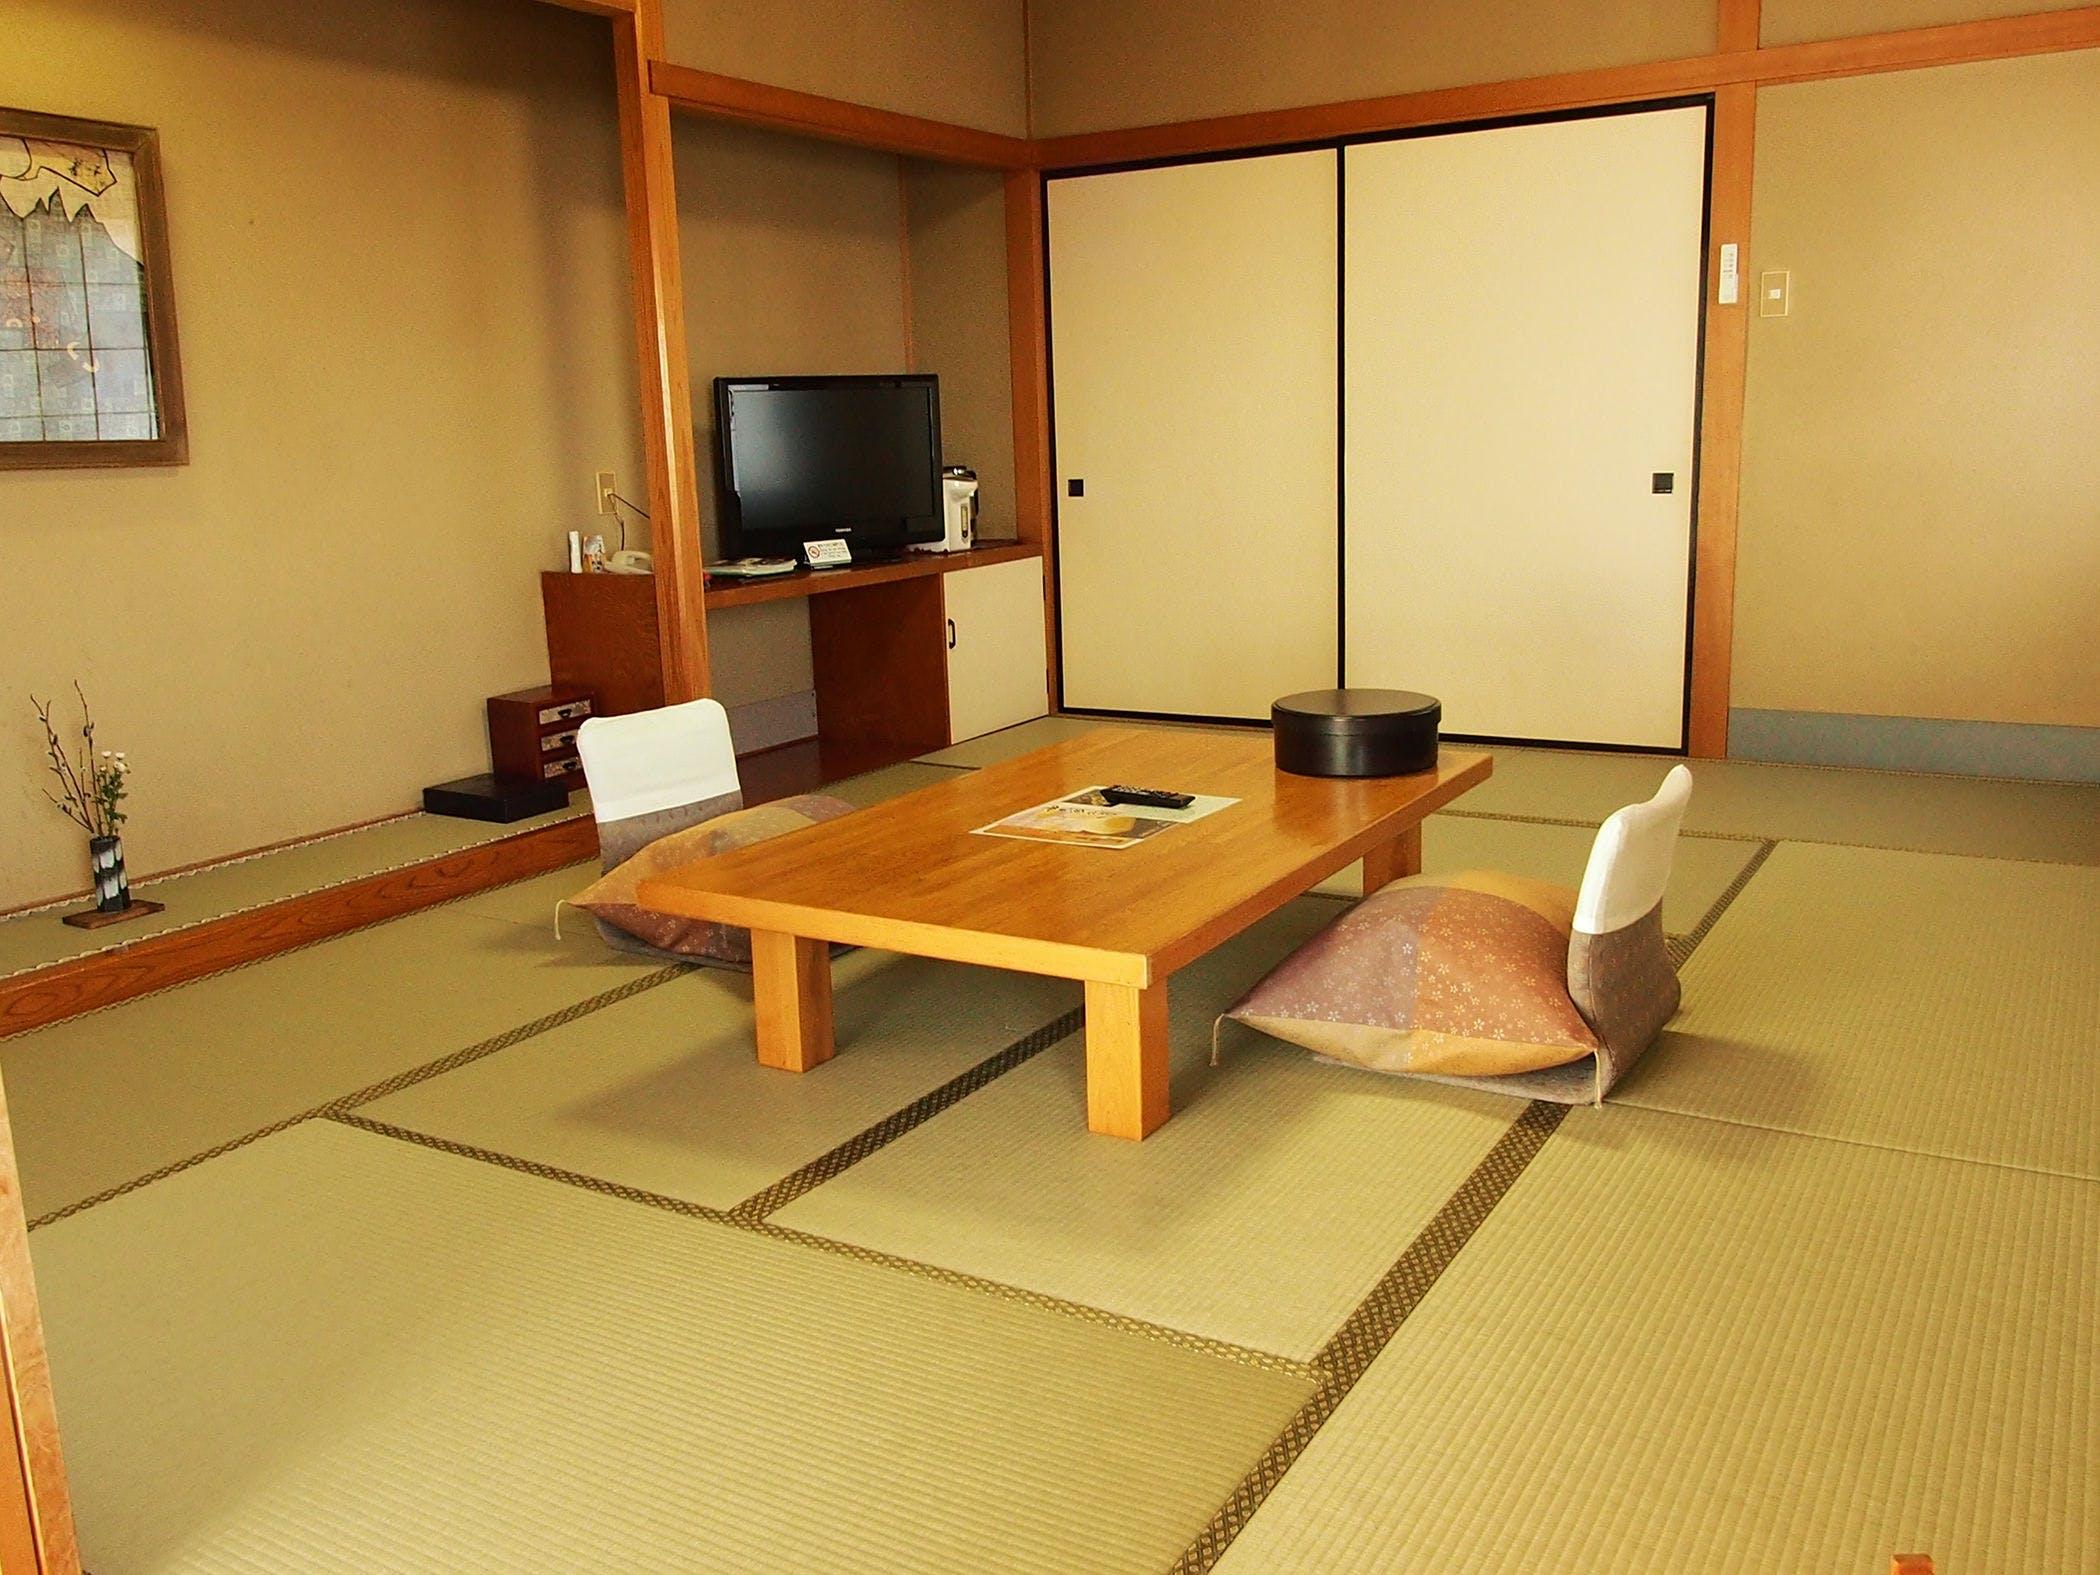 高原 ホテル 松川 屋 那須